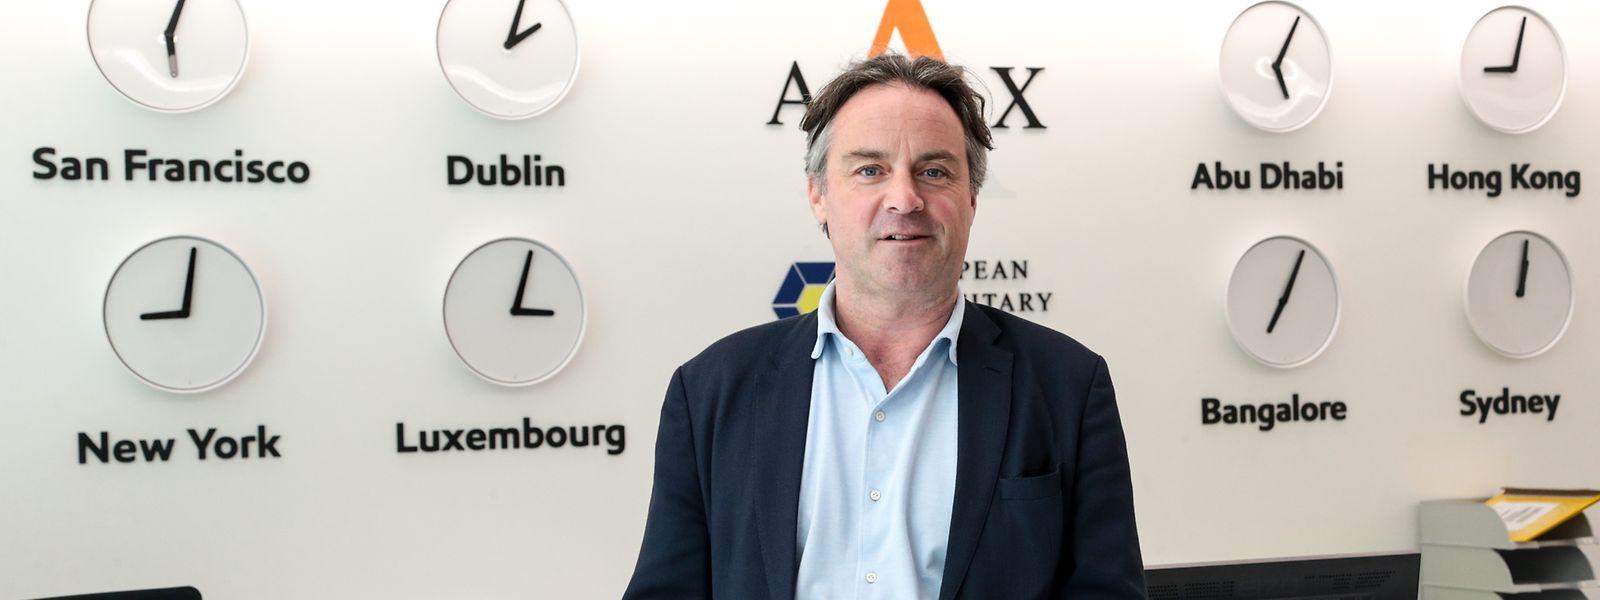 Apex-Gründer Peter Hughes in Munsbach: Der Markt der Fonds-Management-Firmen ist stark zersplittert.